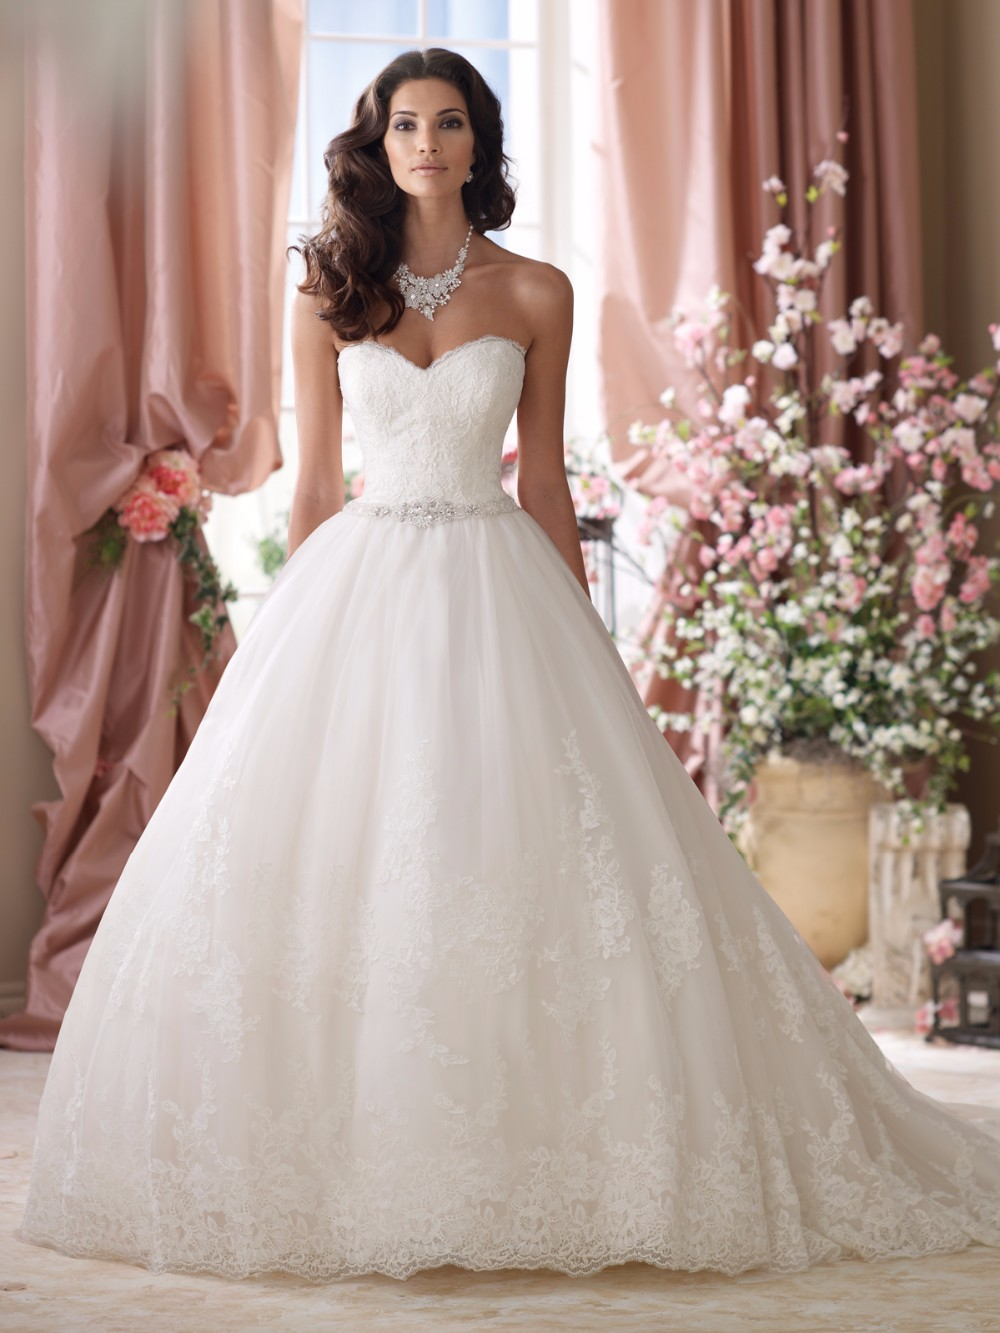 Última moda vestidos de casamento no preço barato por atacado